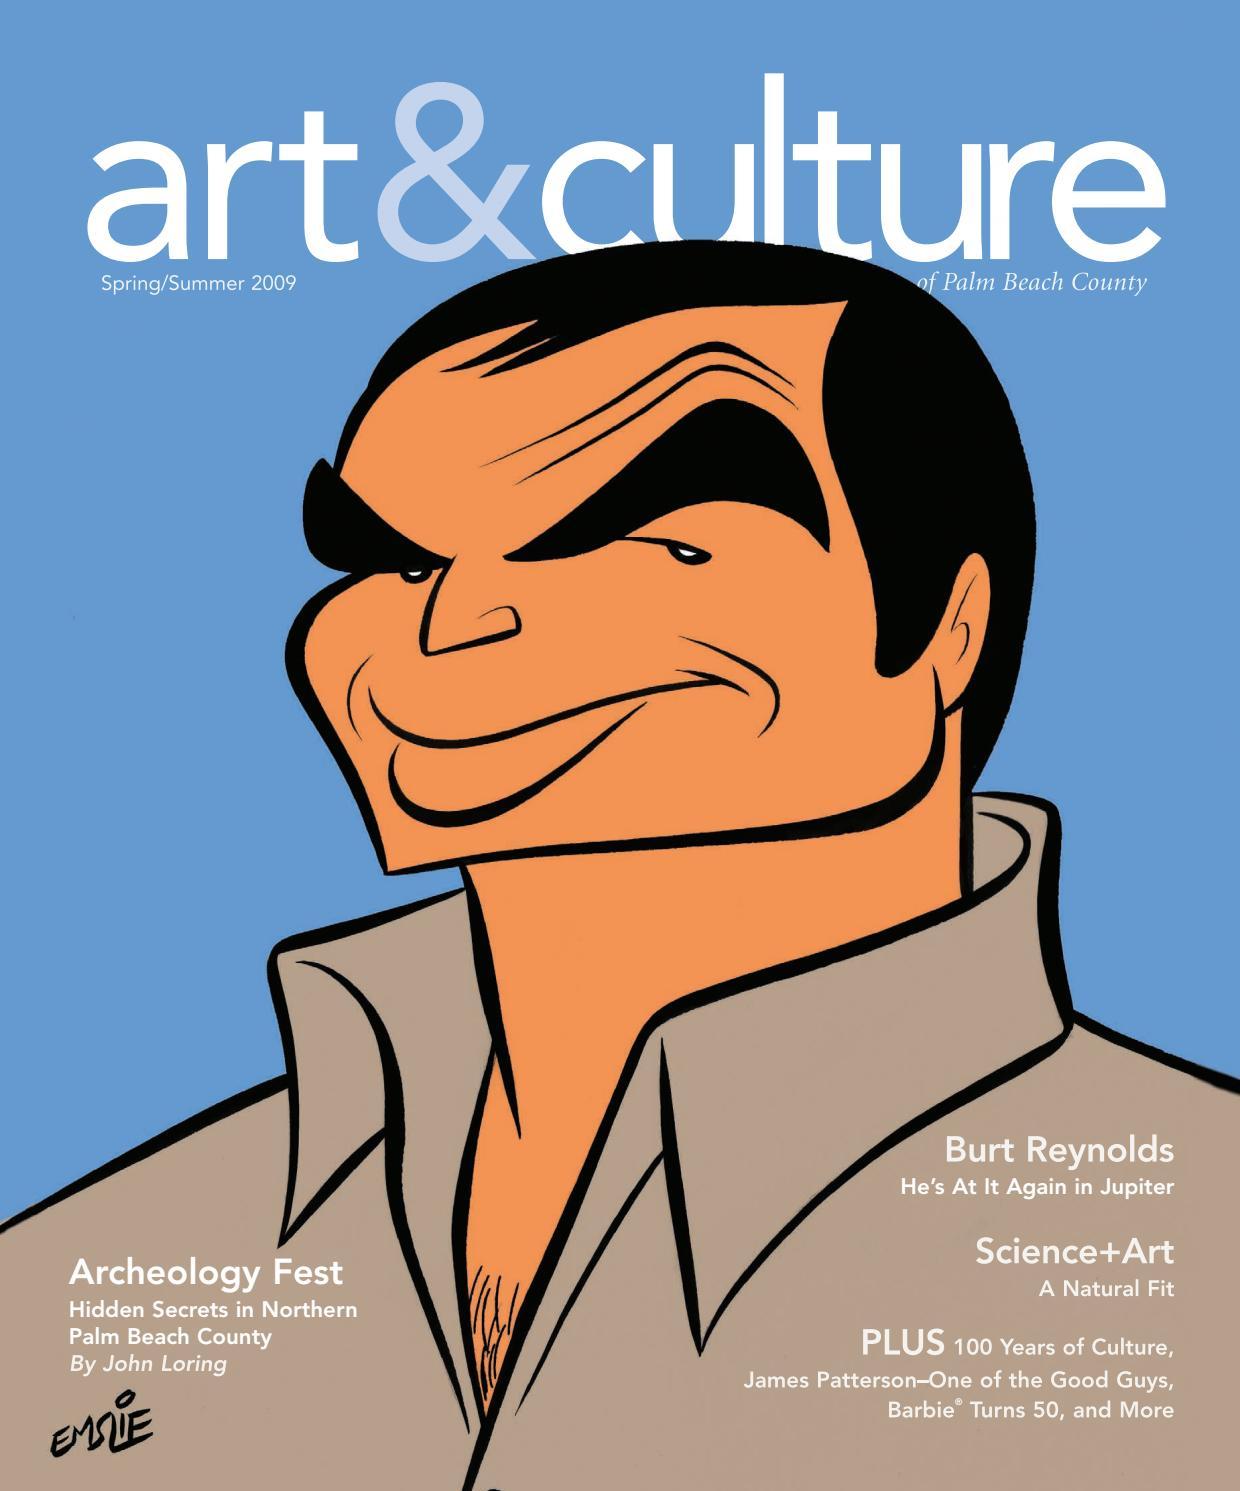 Art Culture Magazine V3i3 Spring 2009 By Passport Publications Media Corporation Issuu